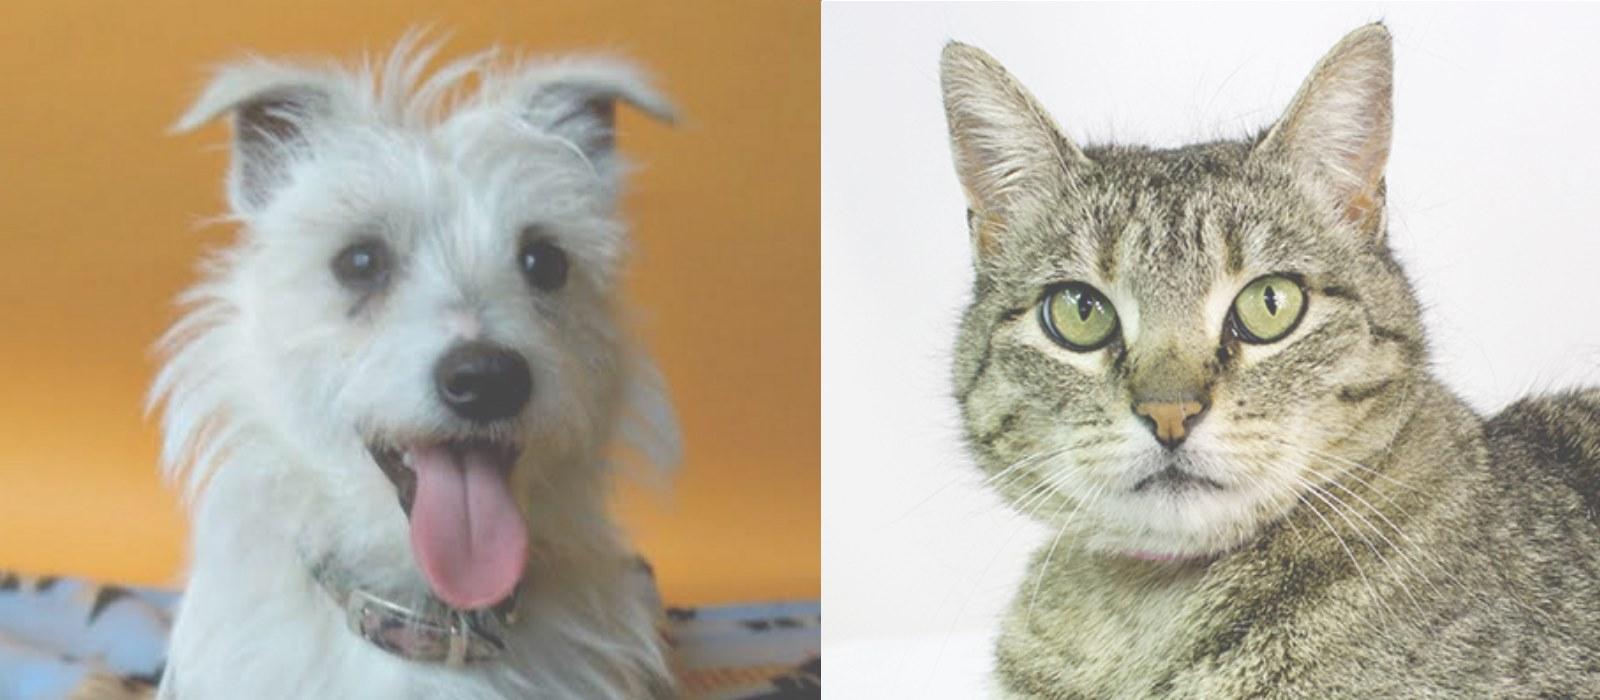 Consider Adopting a Shelter Pet